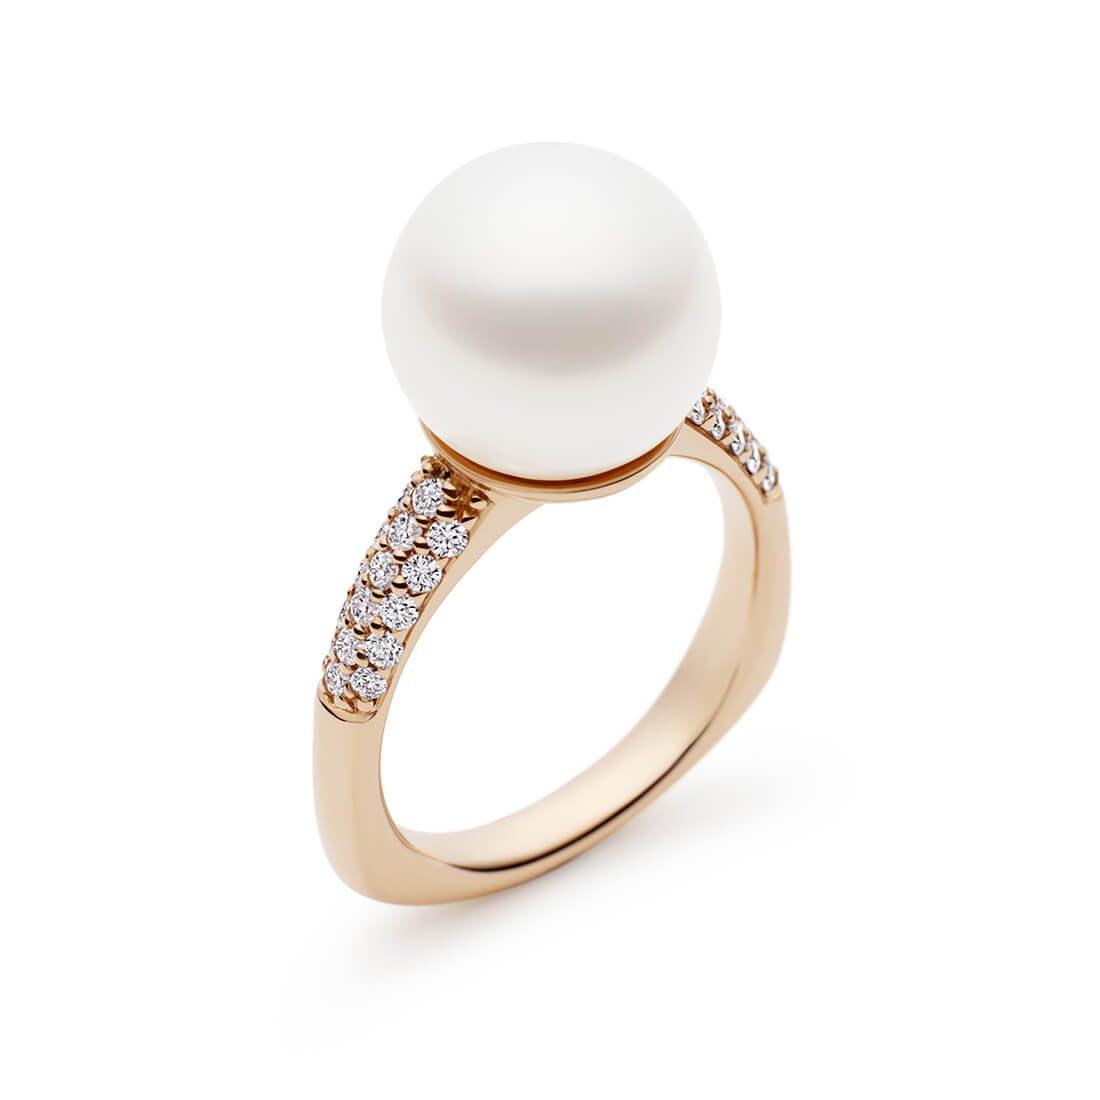 Kailis - Hope Diamond Ring, Rose Gold